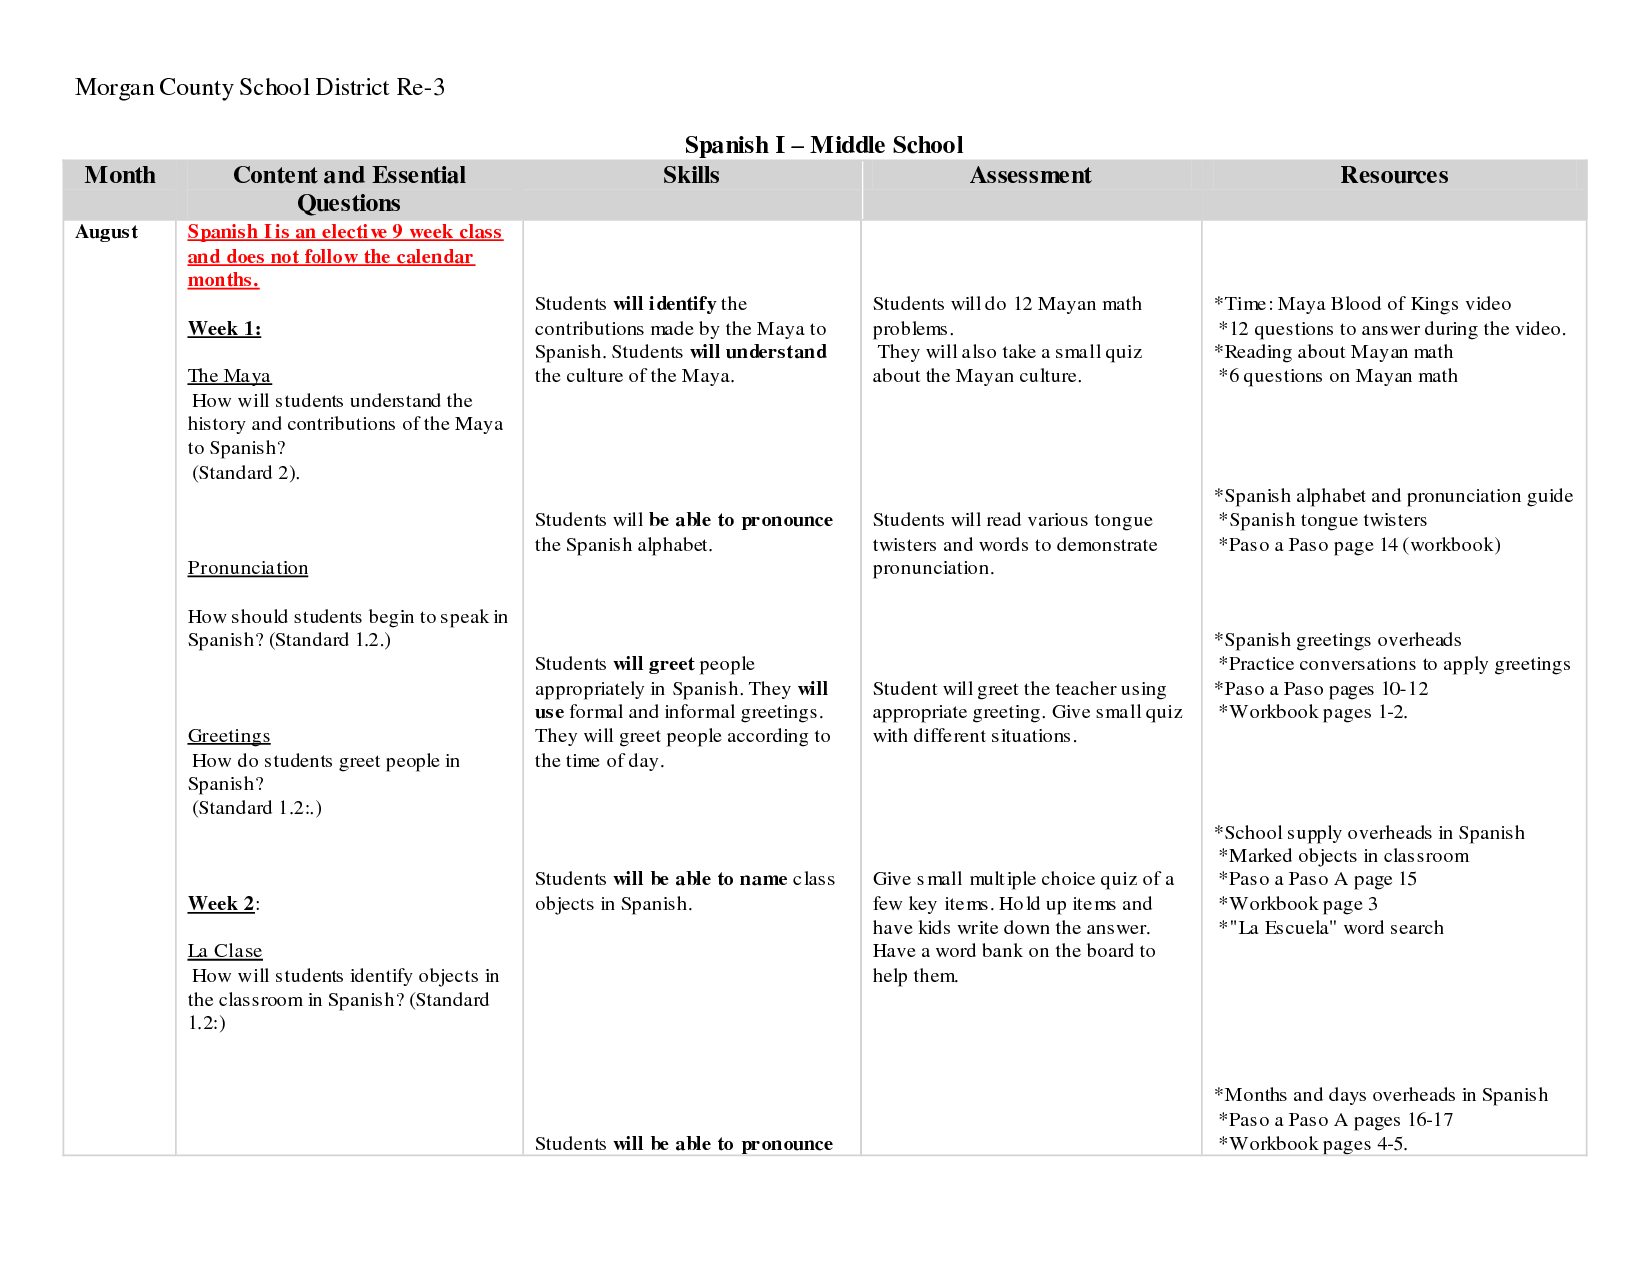 Worksheet : Learn Spanish Worksheets Learning Kindergart - Free Printable Spanish Alphabet Worksheets